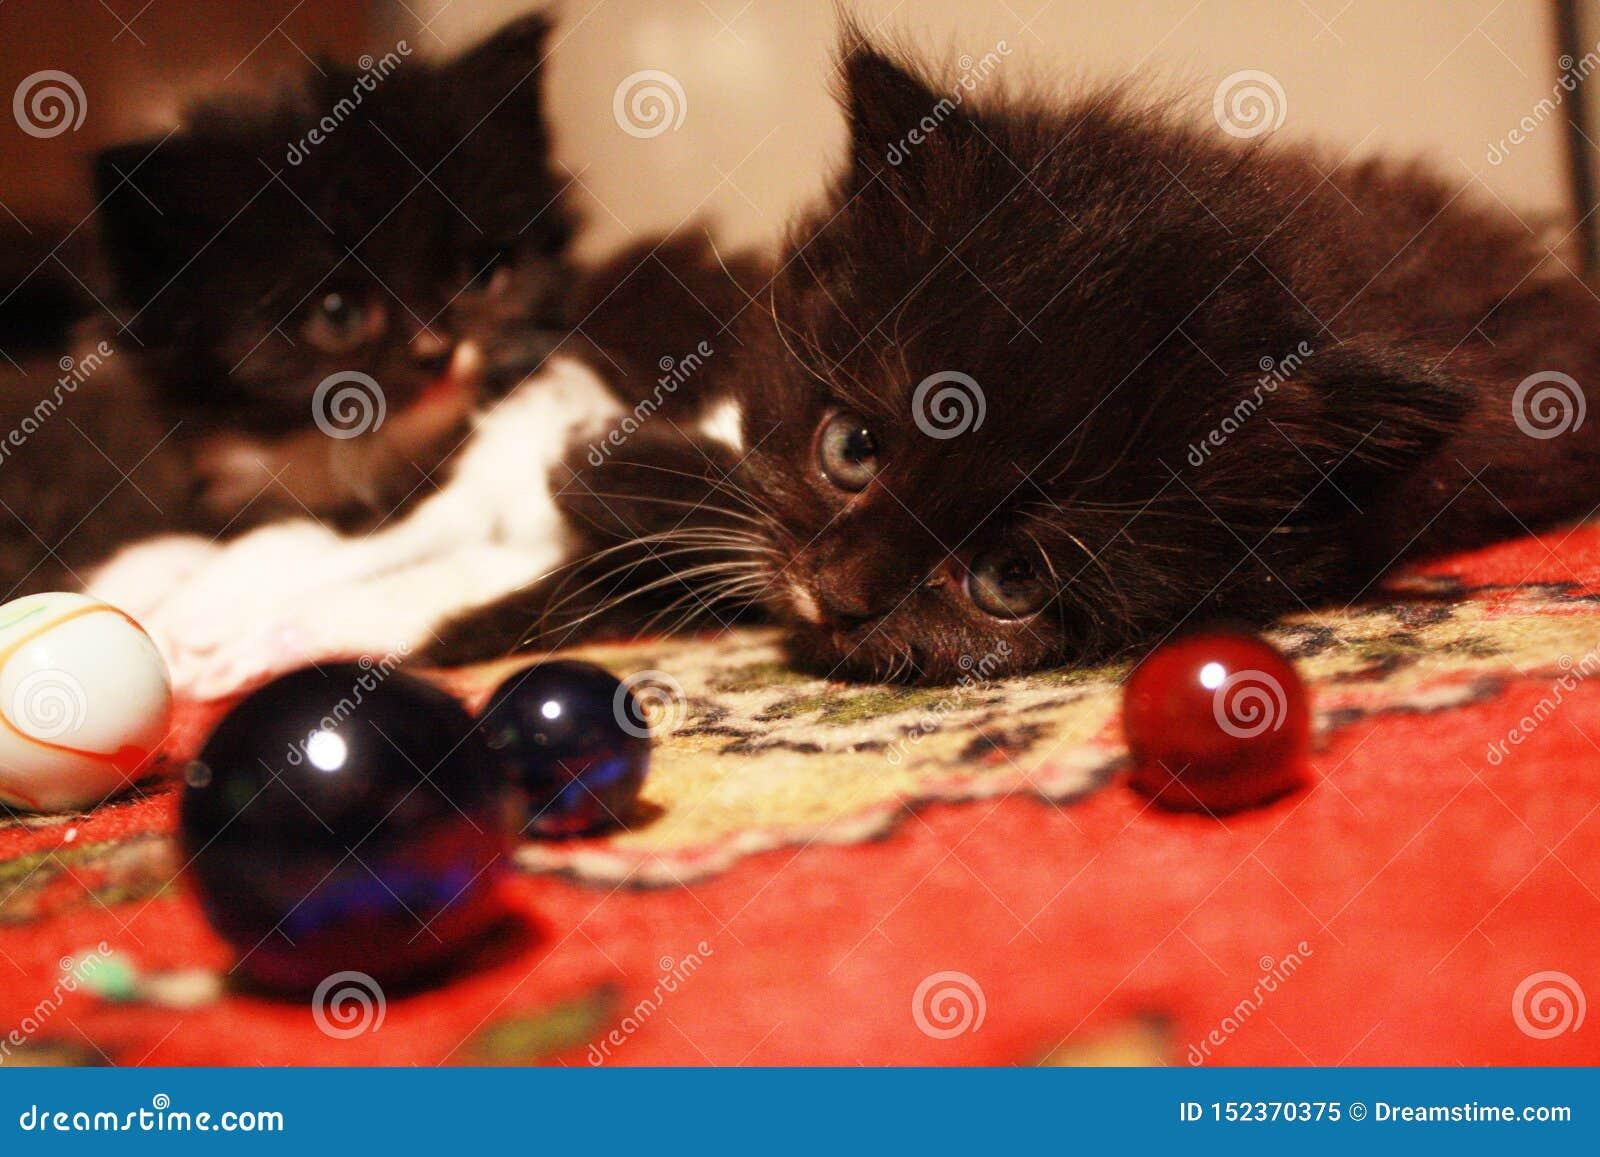 Fluffy kittens and glass balls